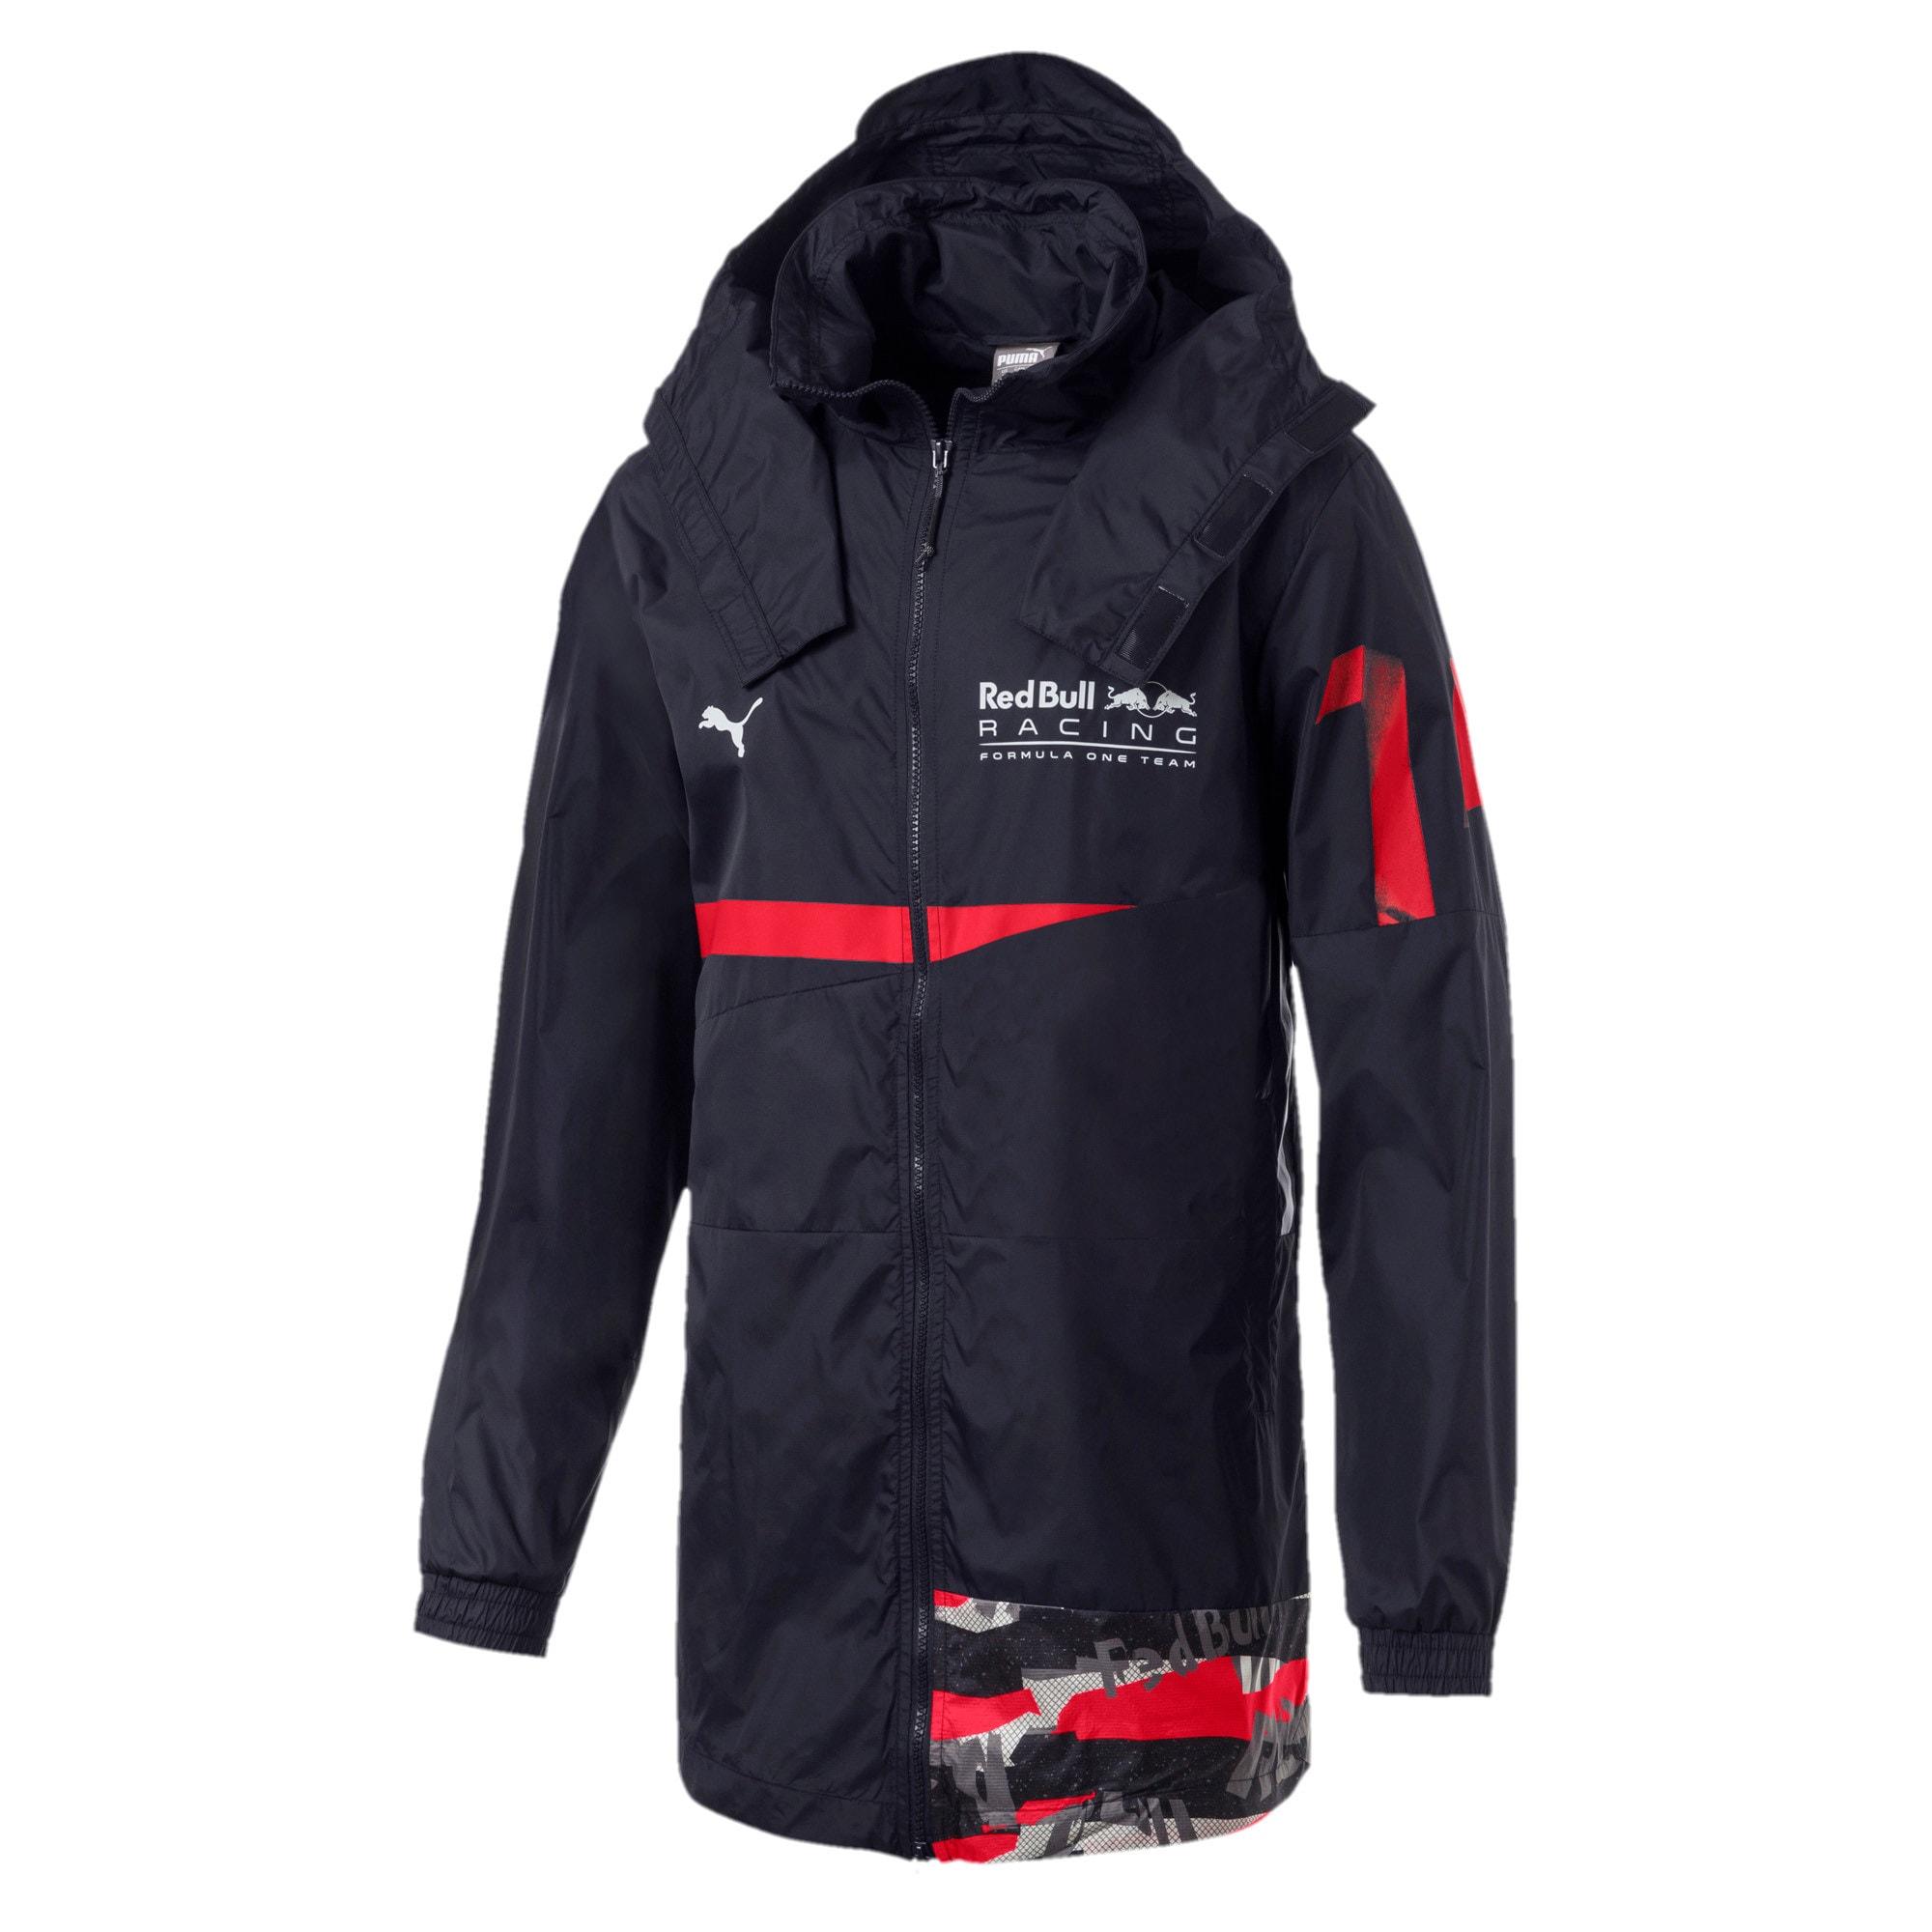 Thumbnail 1 of Red Bull Racing RCT Men's Jacket, NIGHT SKY, medium